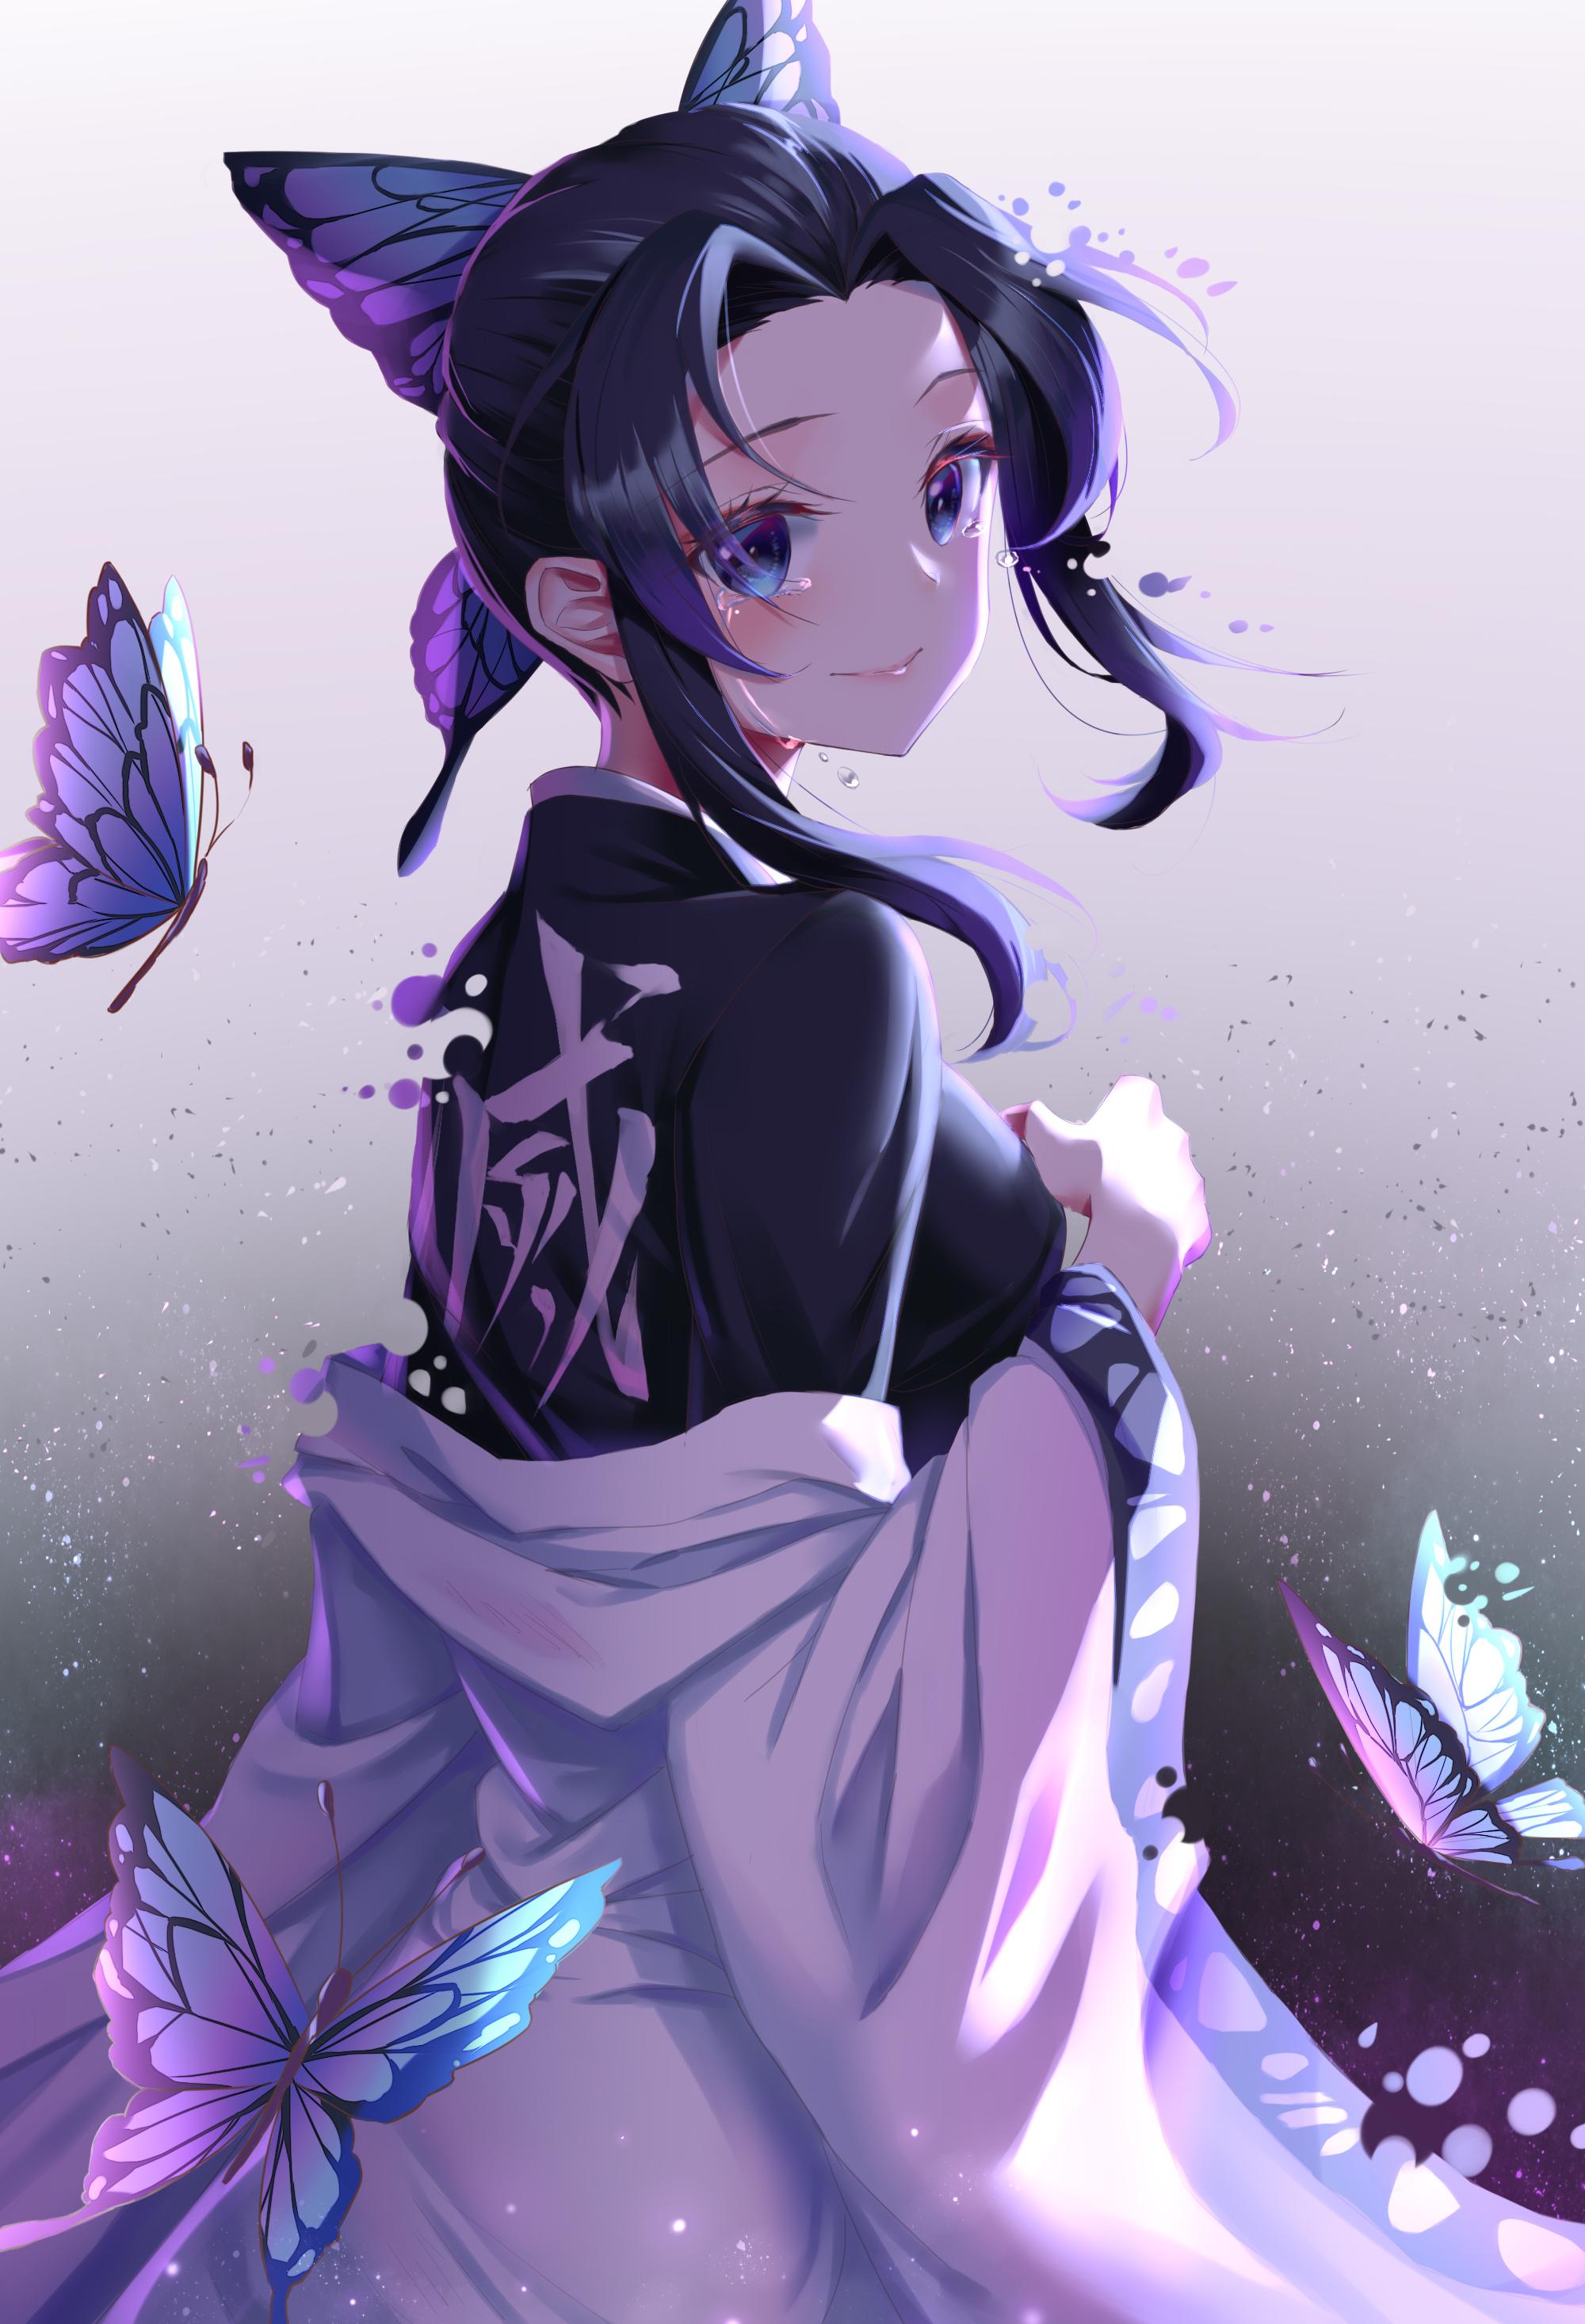 Wallpaper Gadis Anime Seni Digital Karya Seni Tampilan Potret Vertikal 2d Kimetsu No Yaiba Kochou Shinobu 2000x2933 Acgacheng 1662375 Hd Wallpapers Wallhere